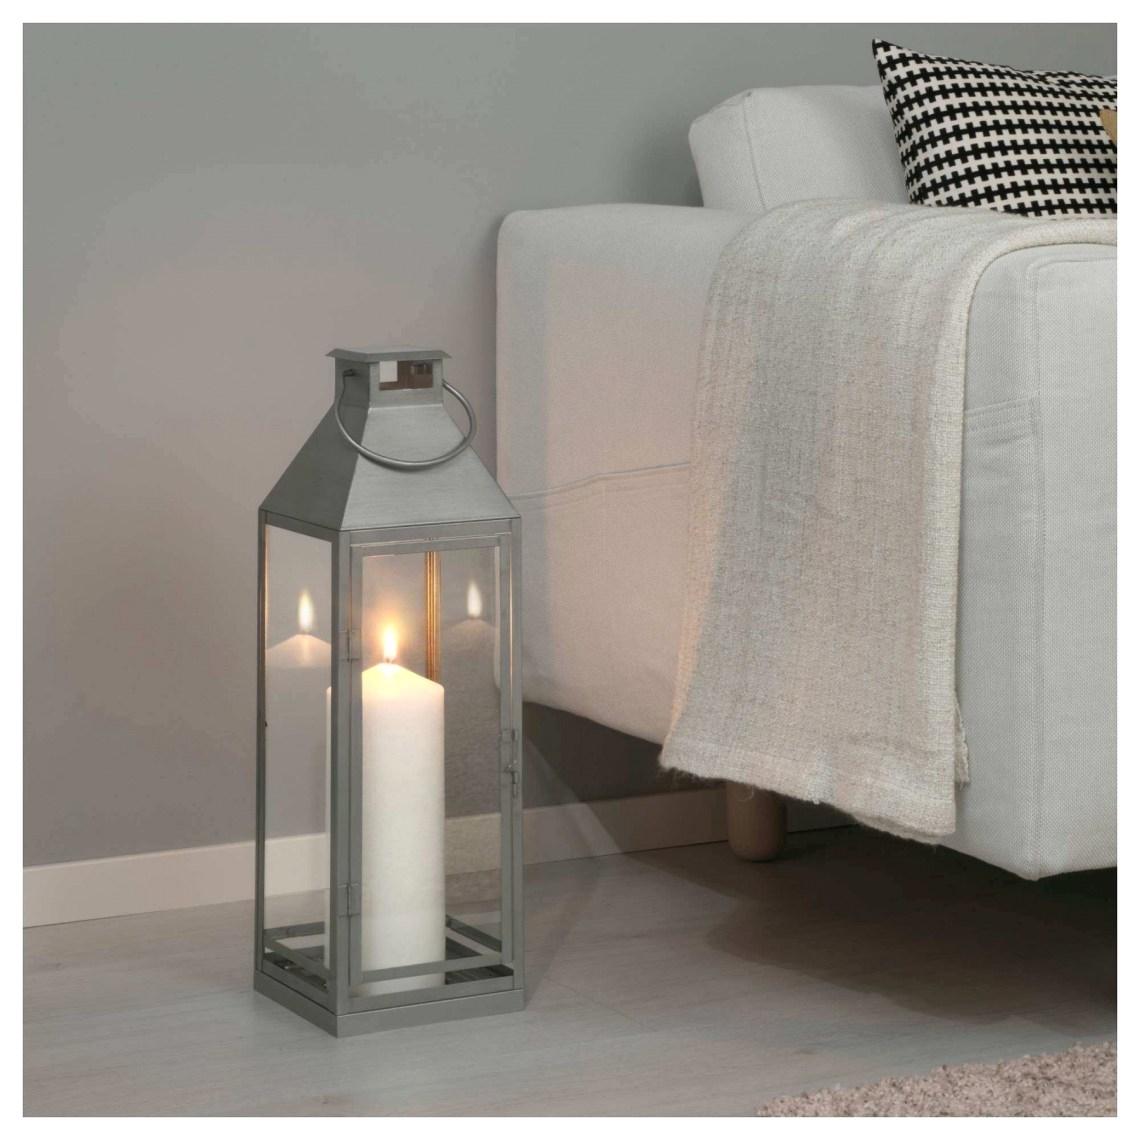 cool floor lamps elegant lamps cottage lamps cottage lamps 0d from standing lamps ikea sourcehaccptemperature com